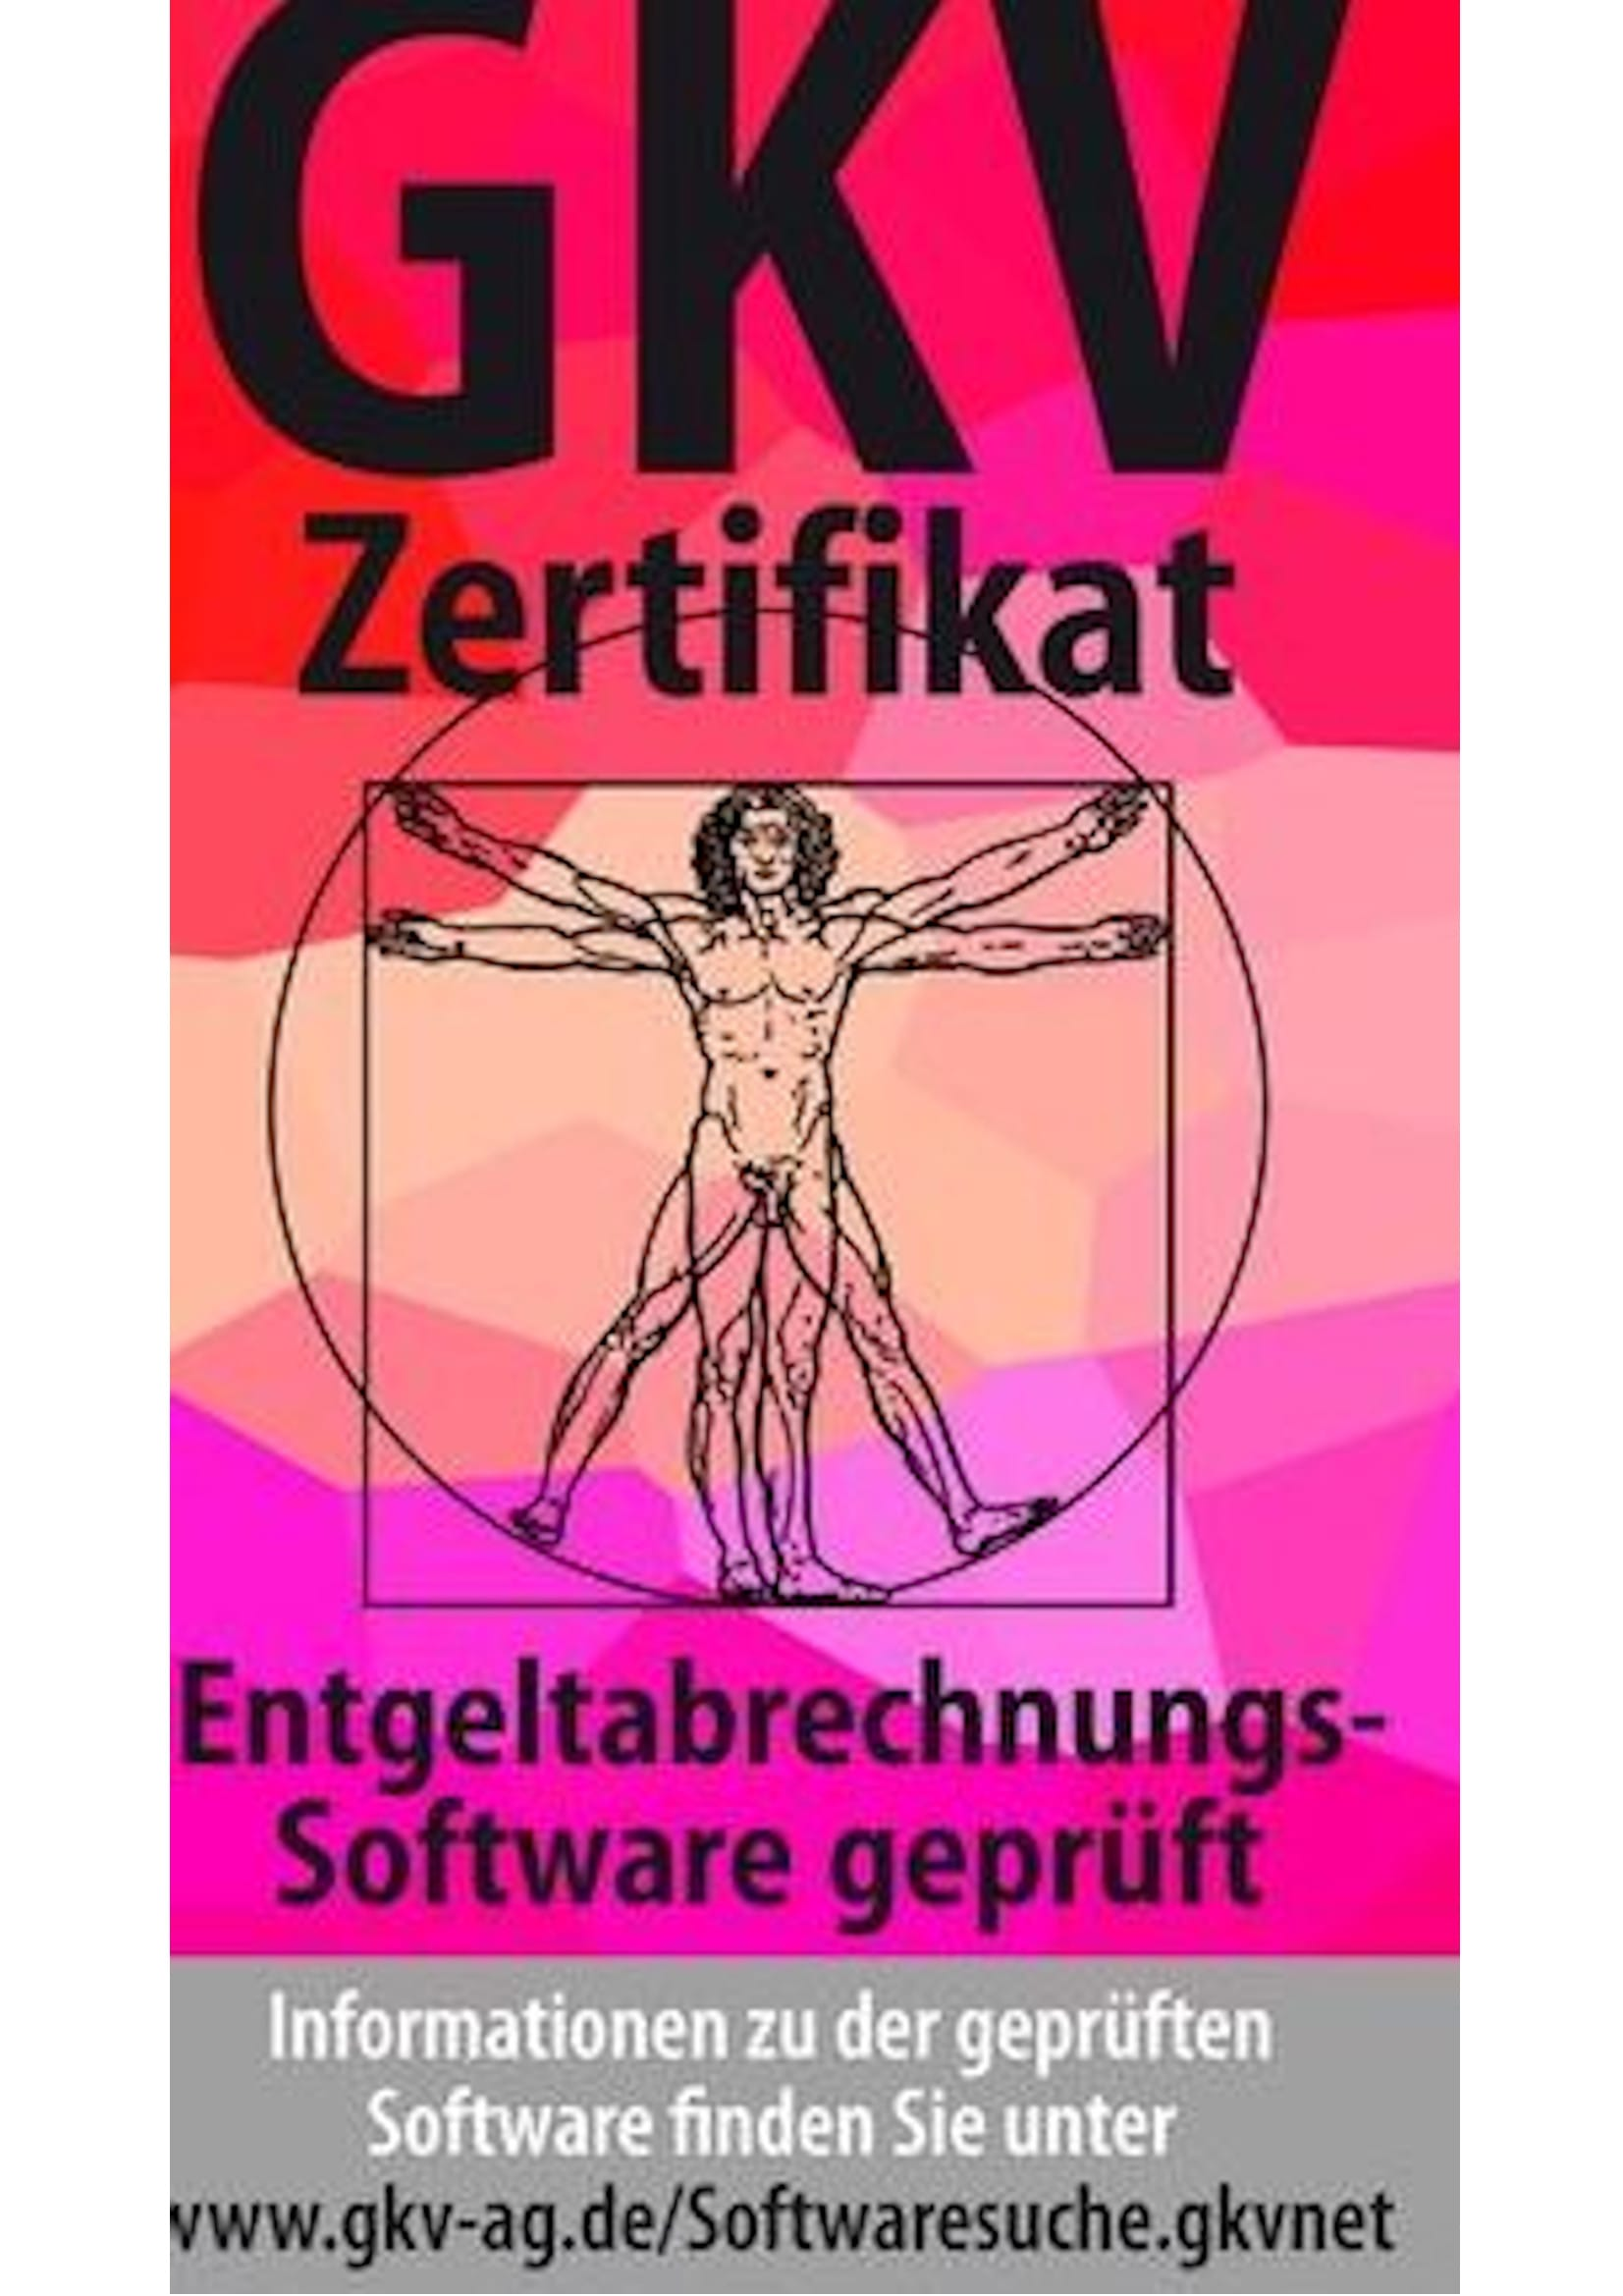 GKV Zertifikat Gelbing